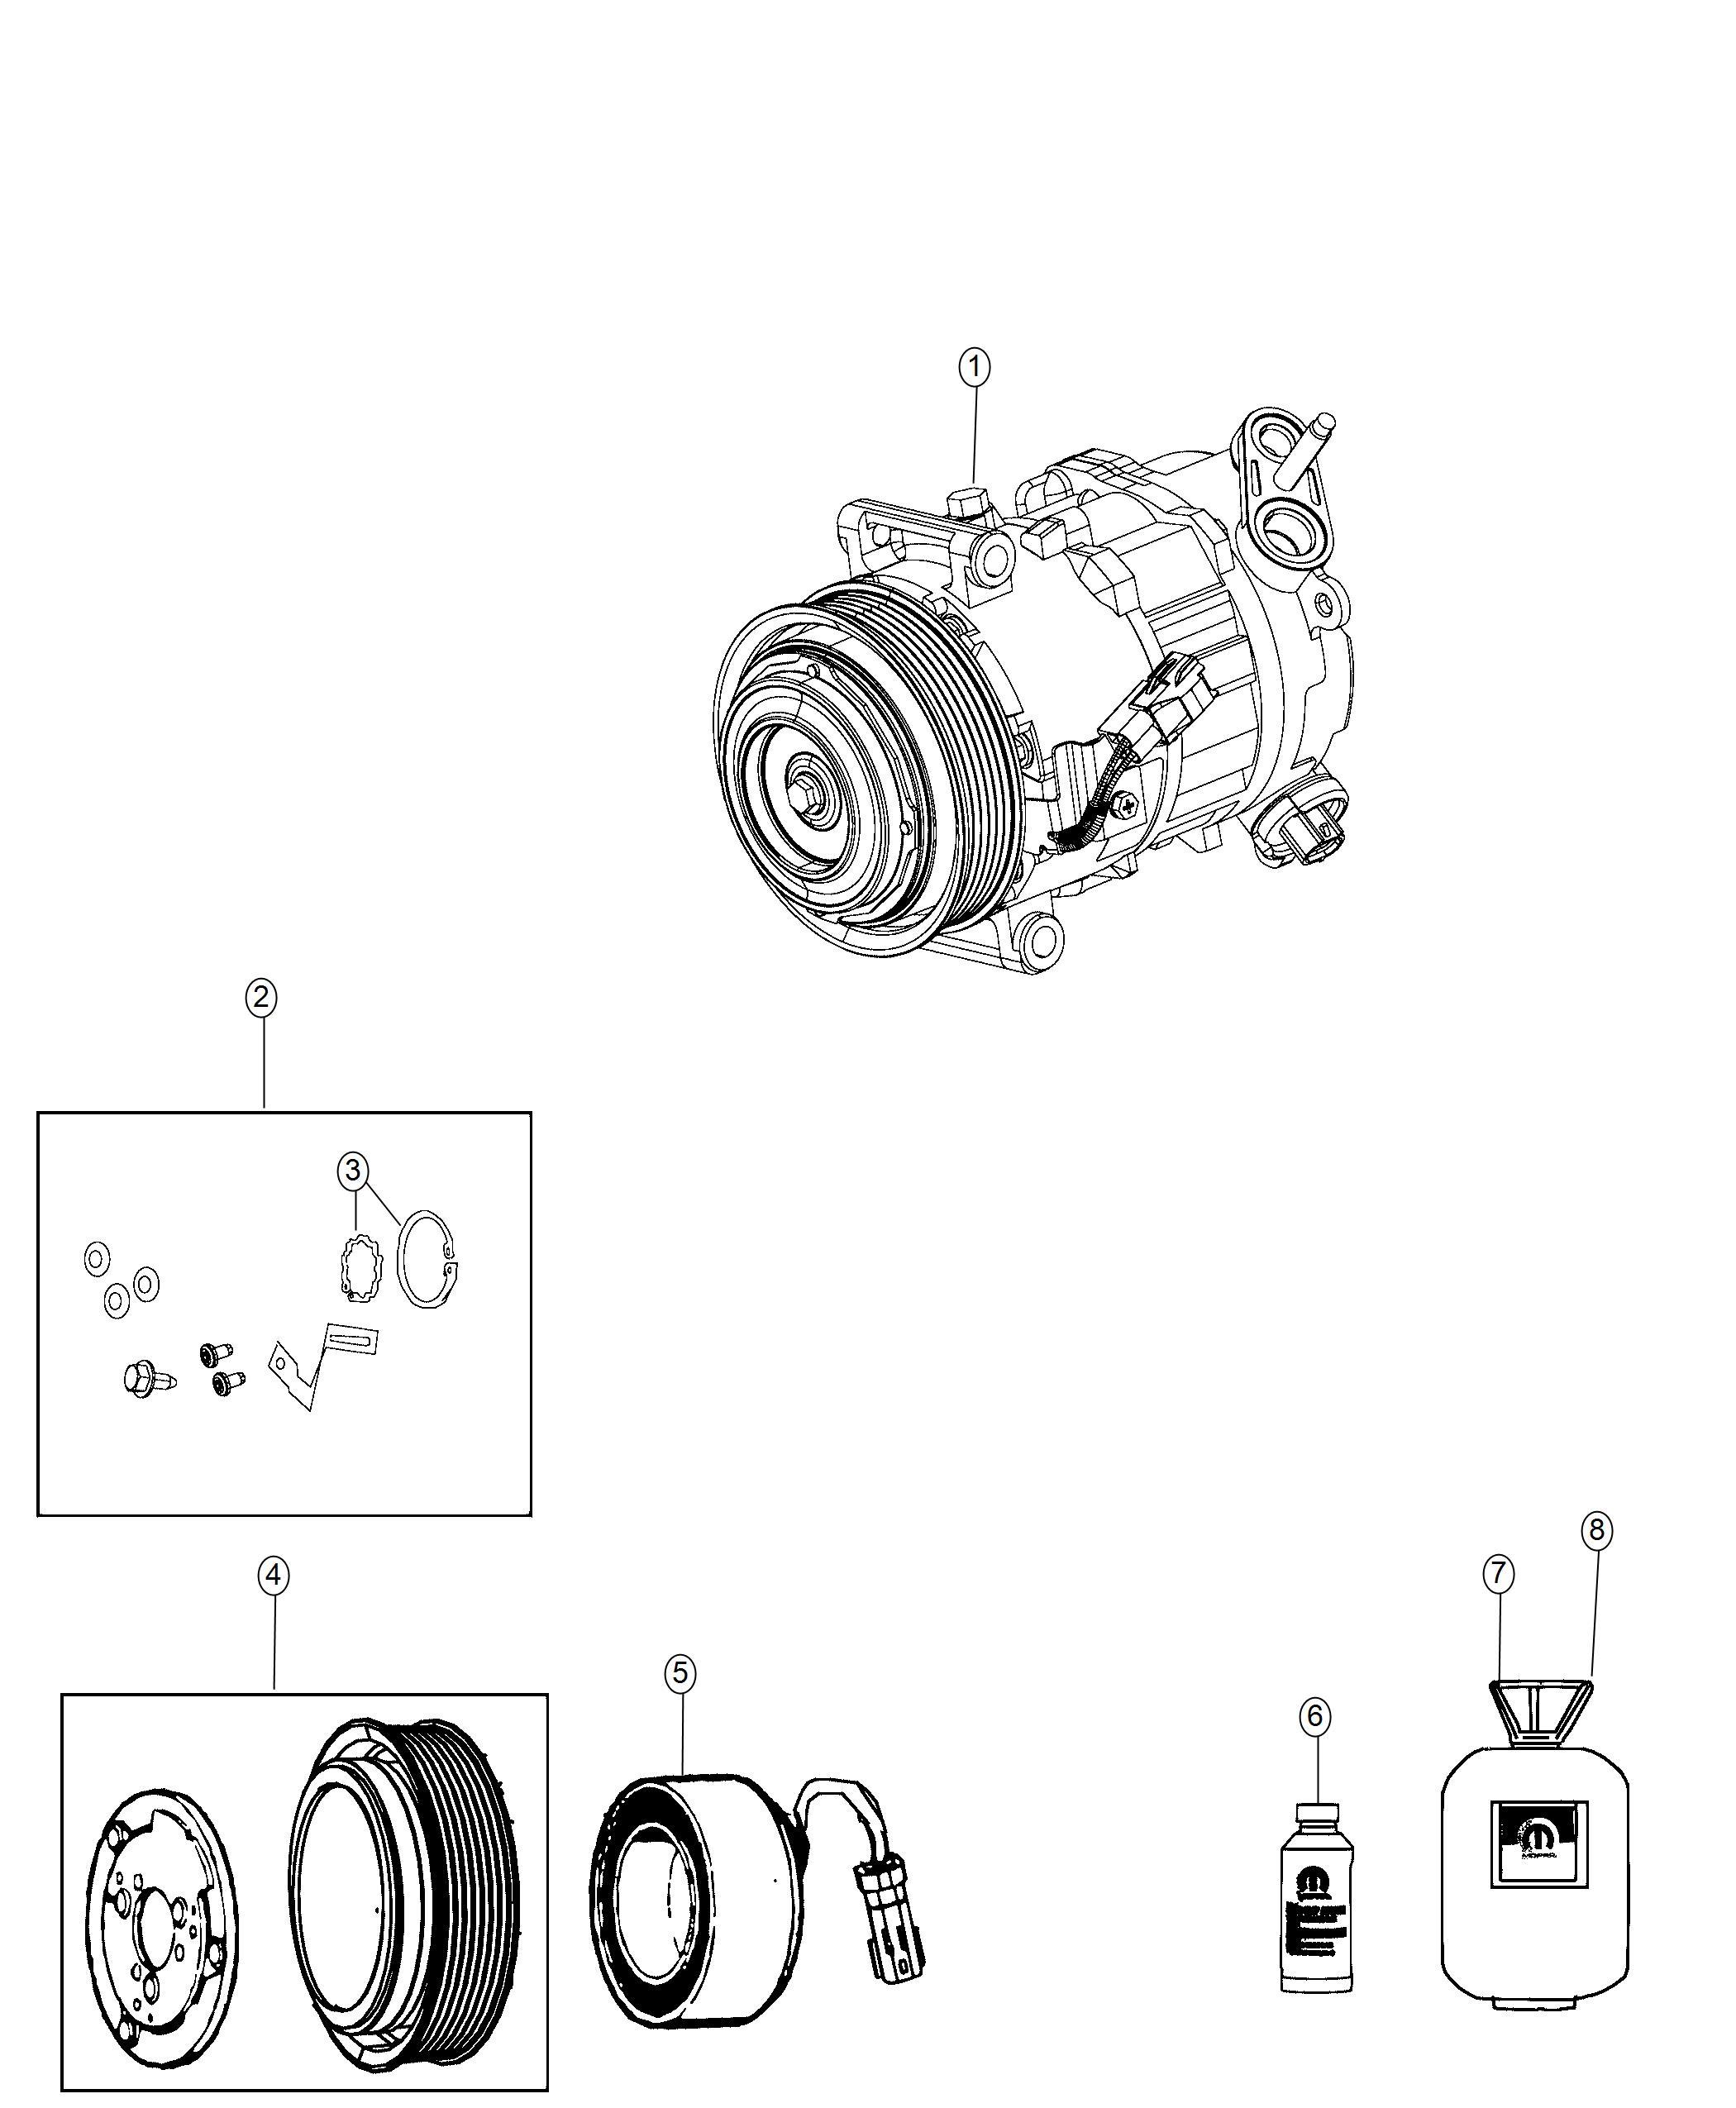 Jeep Cherokee Coil Stator A C Compressor Clutch Air